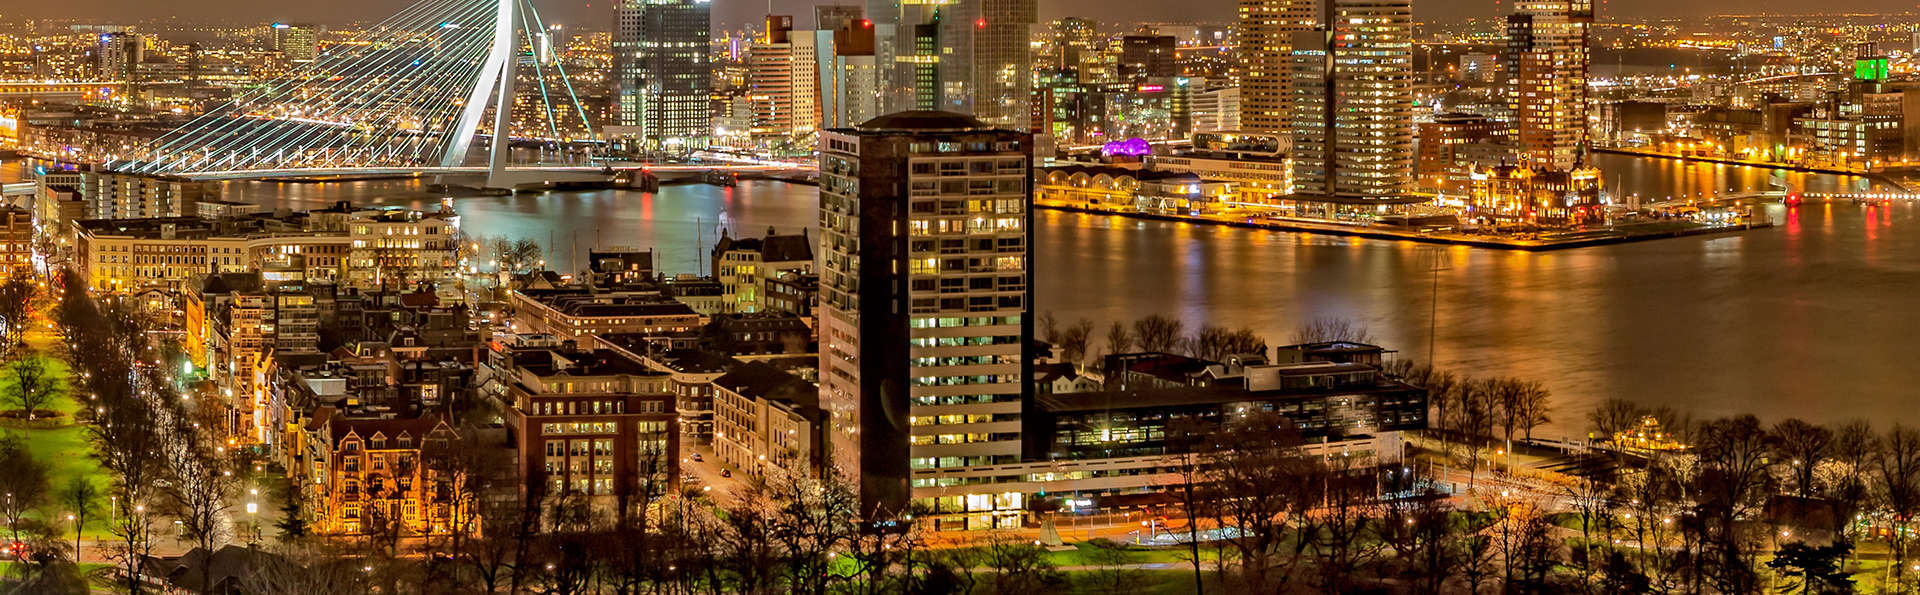 Bastion Hotel Barendrecht - Edit_Rotterdam.jpg